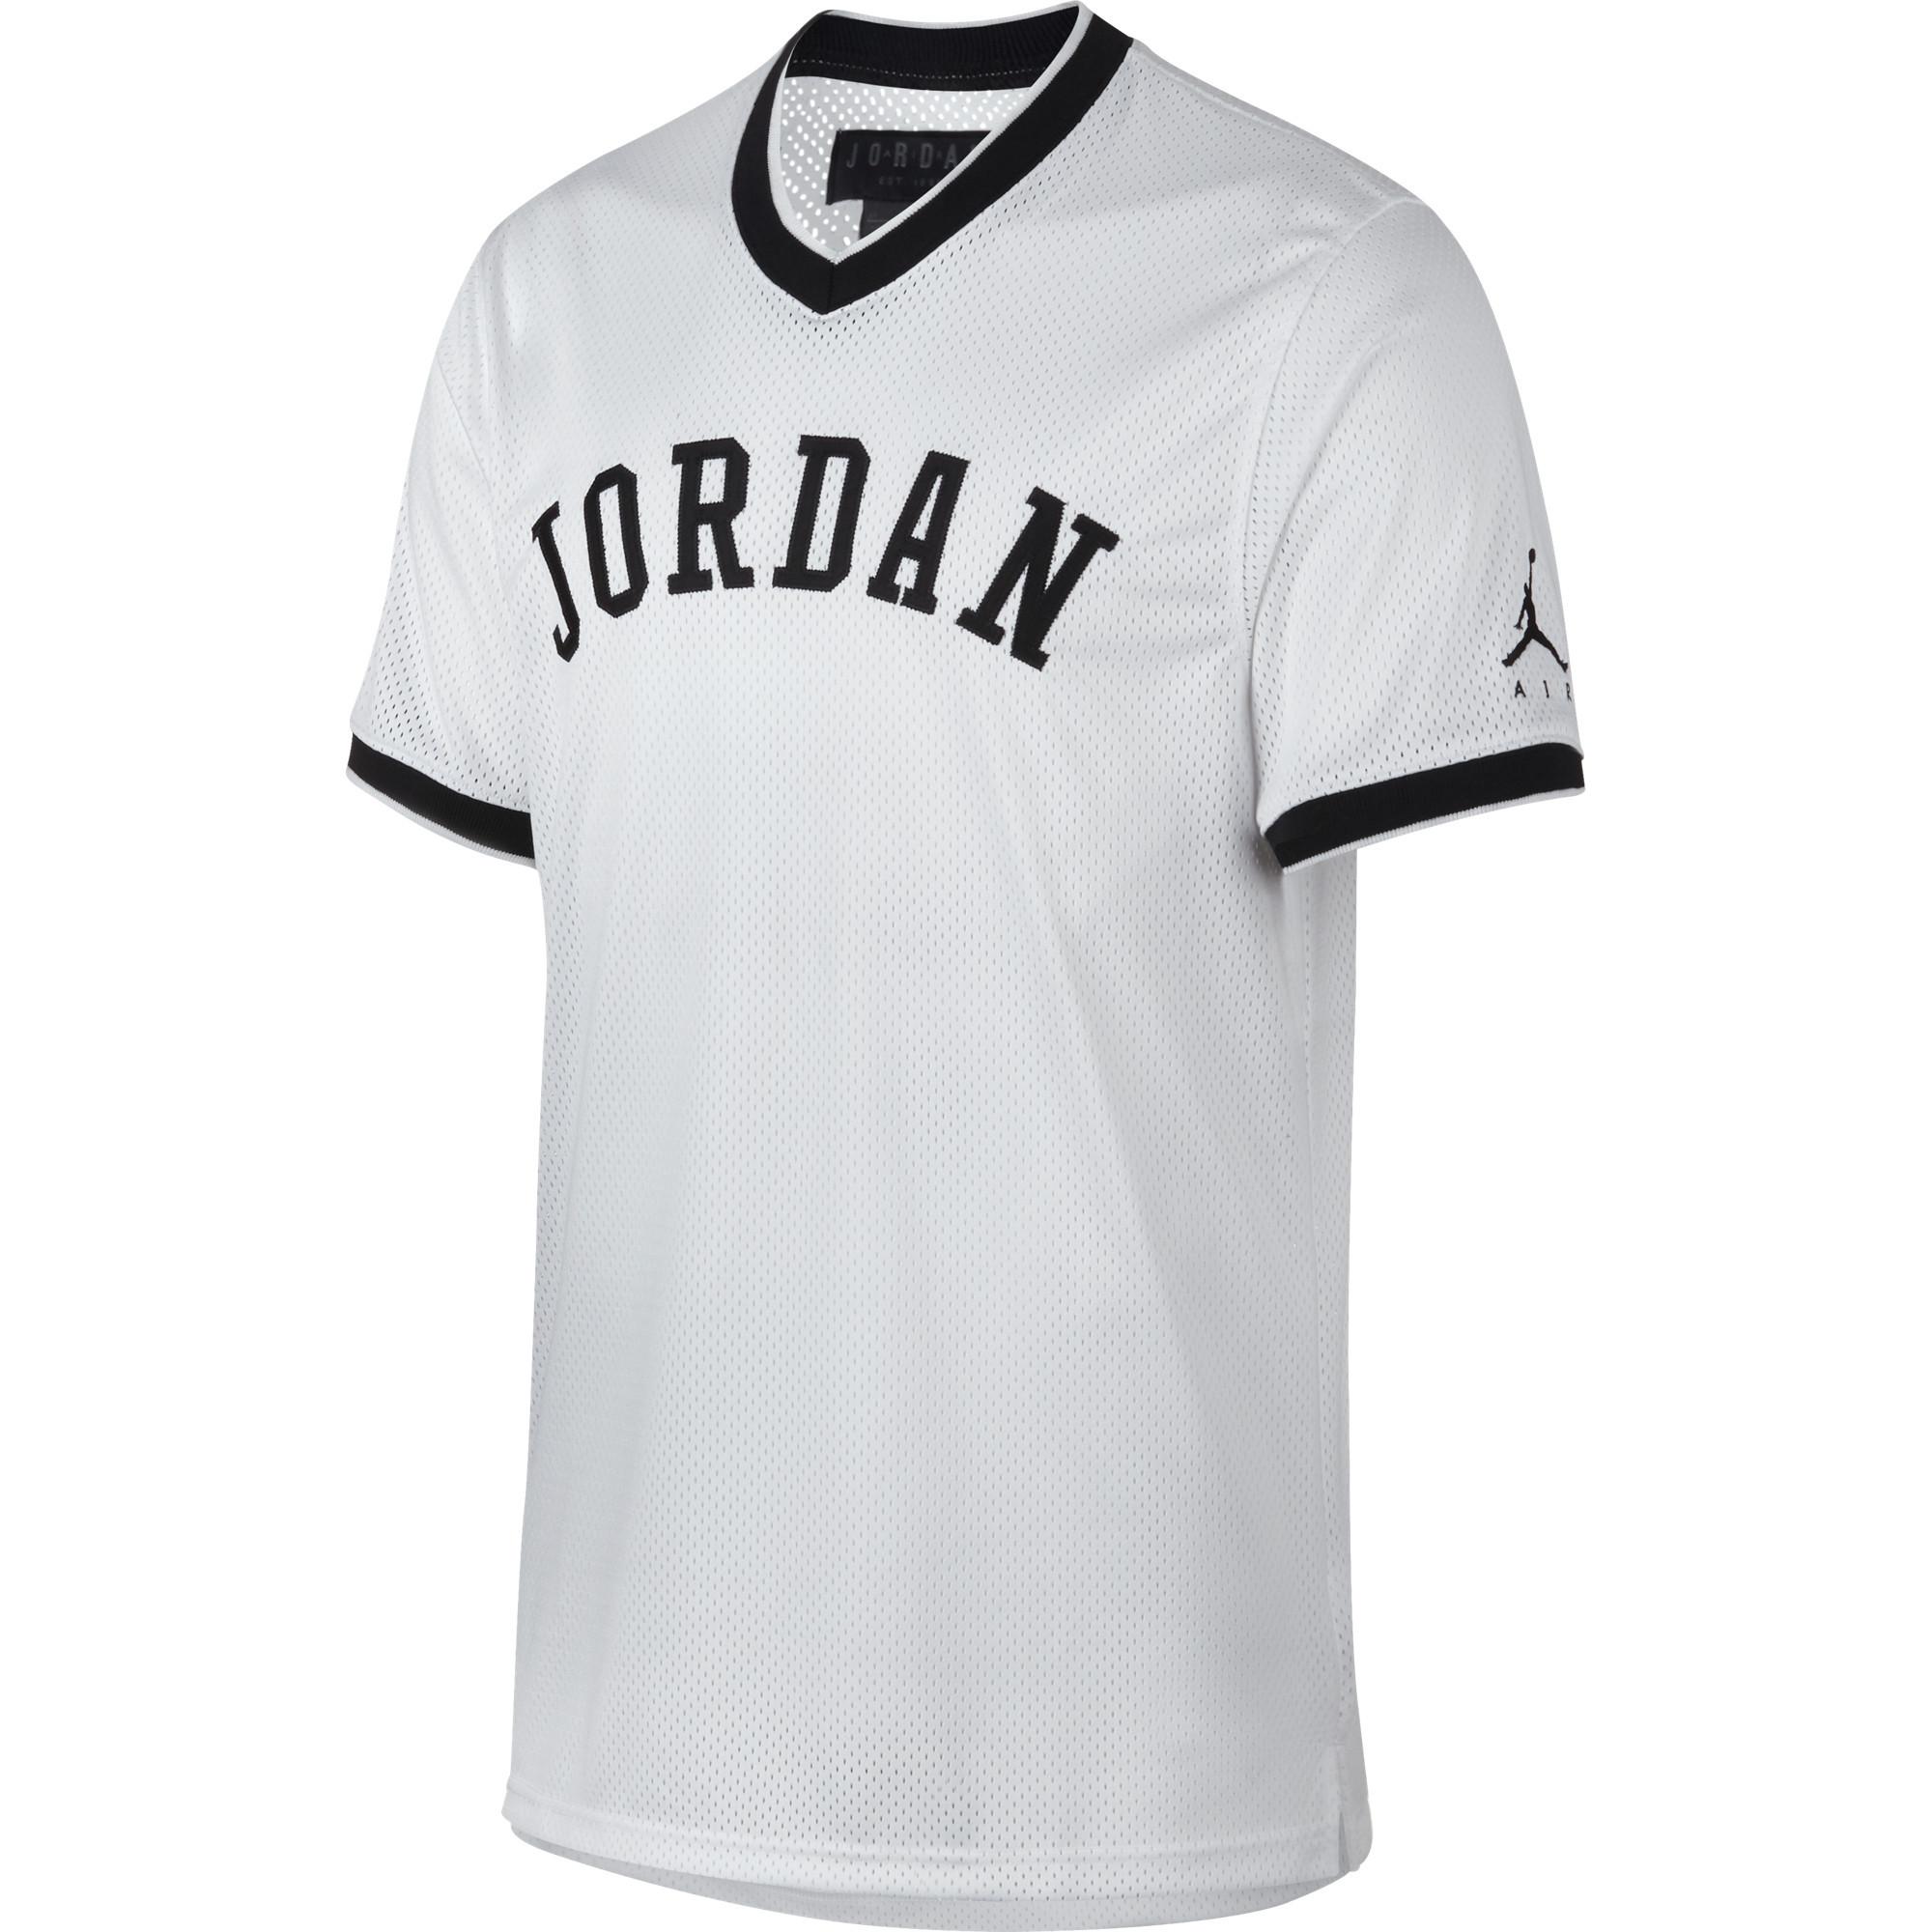 Tee shirt Nike JORDAN JUMPMAN AIR MESH DownTownStock.Com